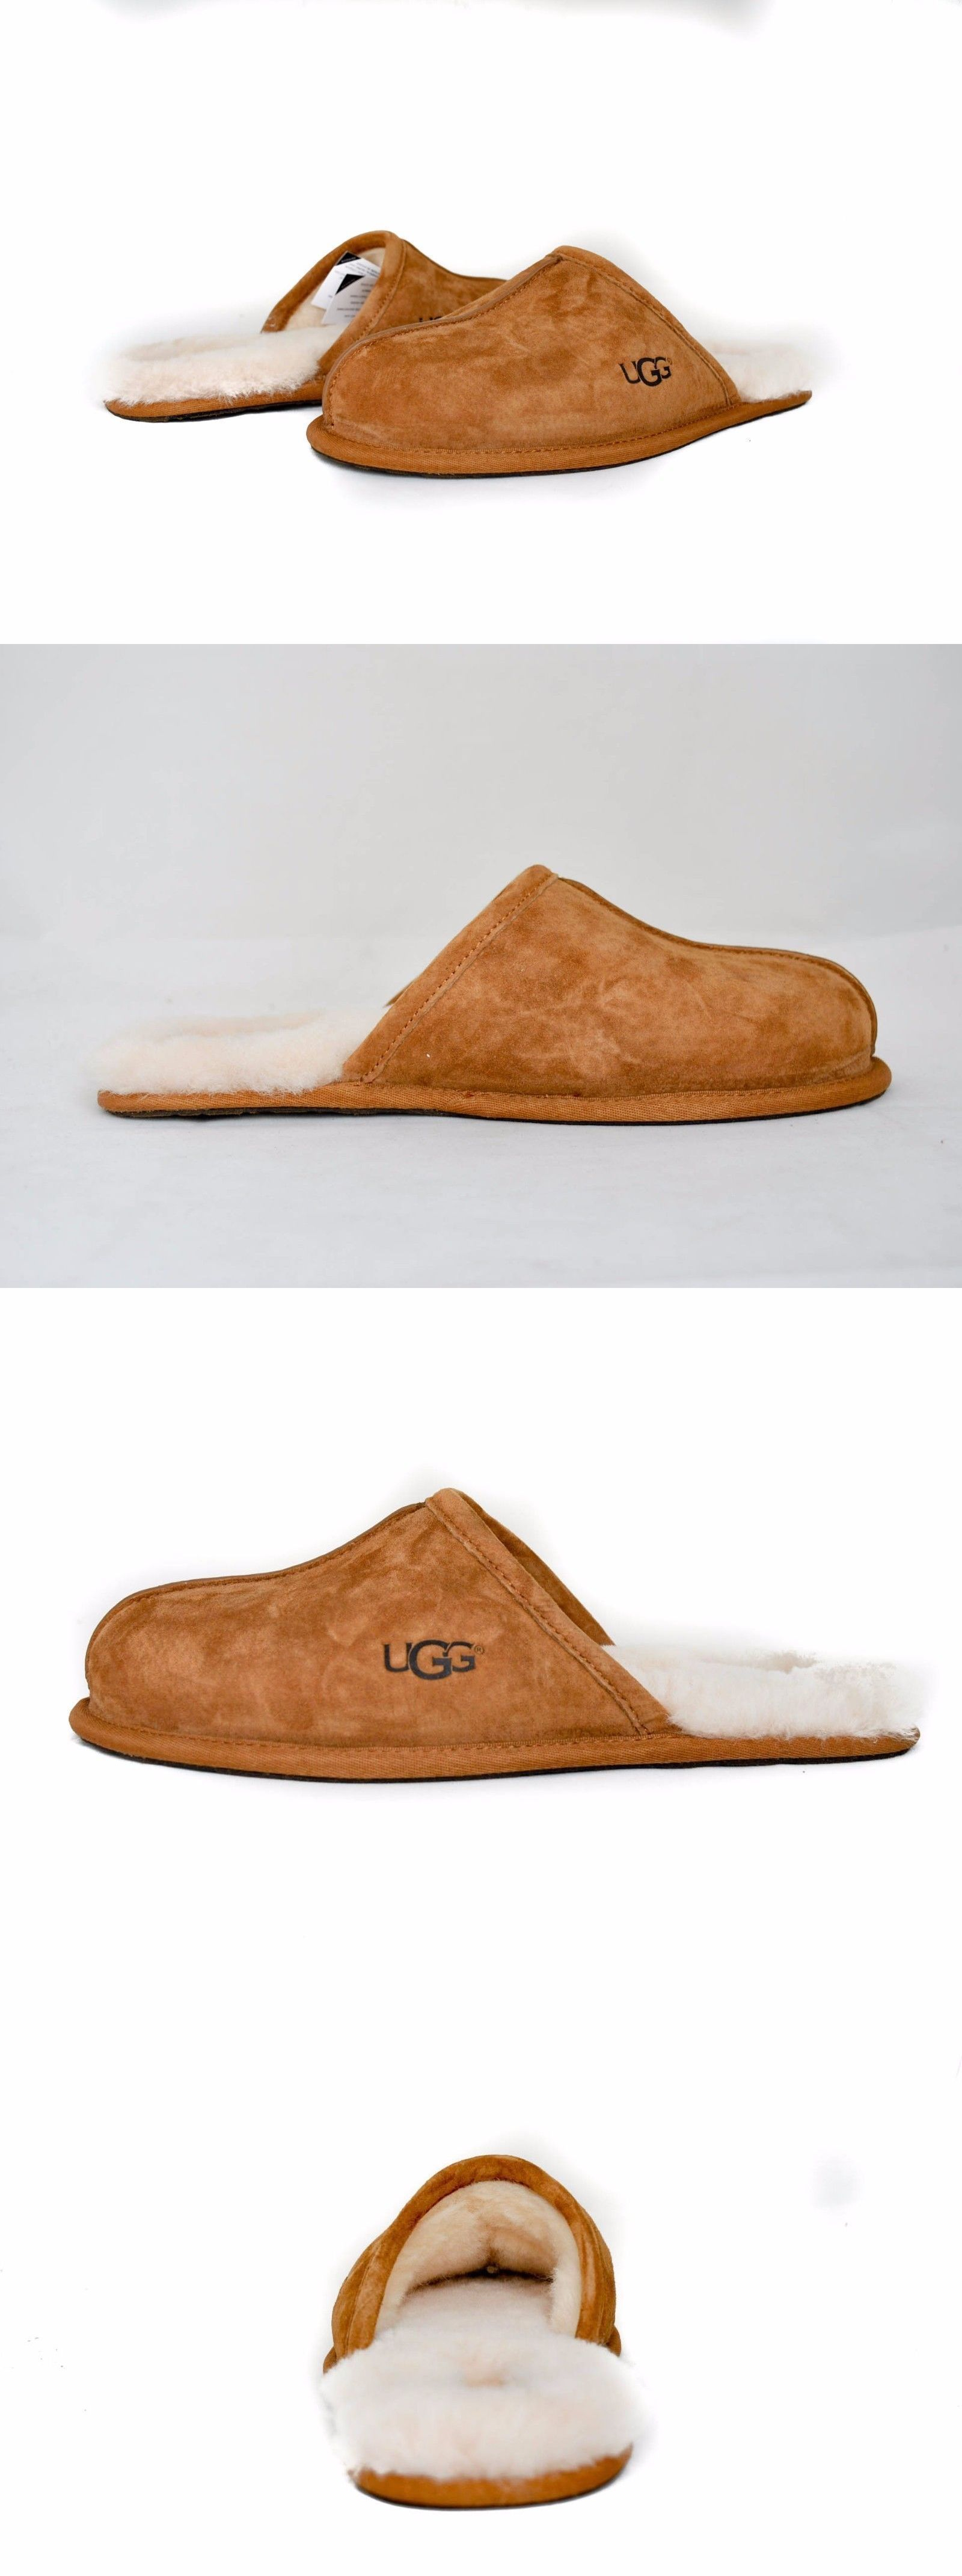 c989de83071 Slippers 11505: Ugg Australia Men S Scuff Slippers Shoes 5776 ...